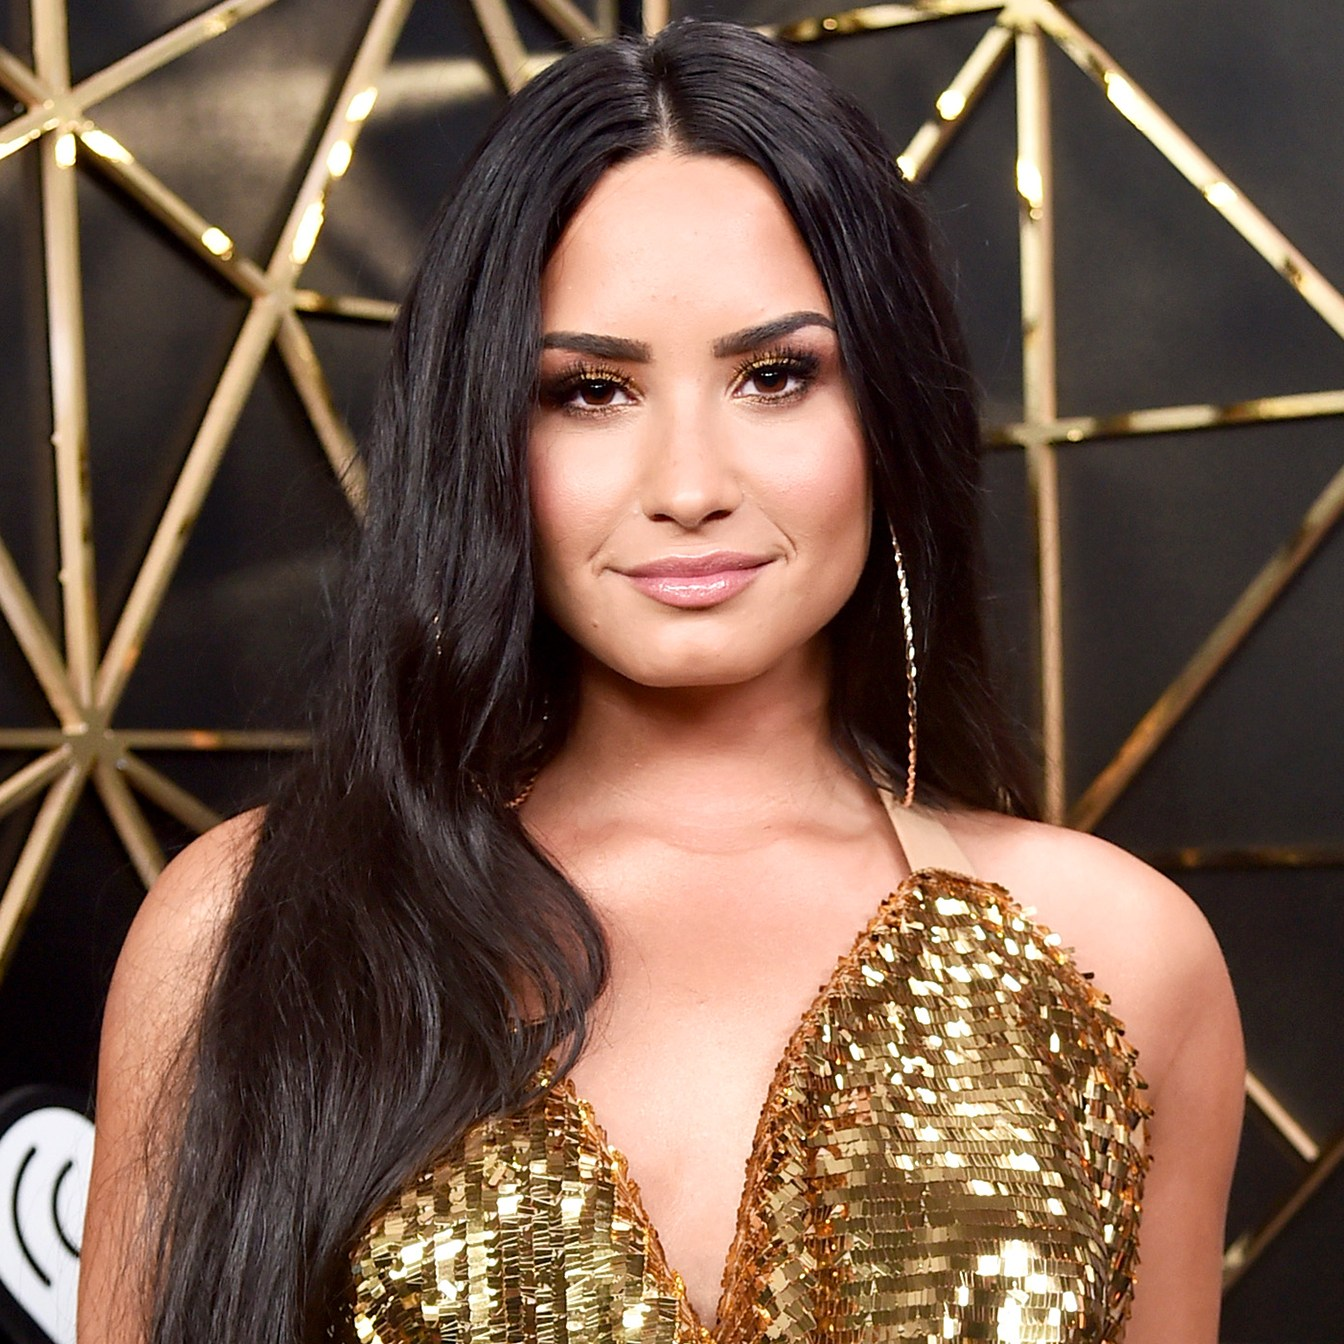 Demi Lovato bully